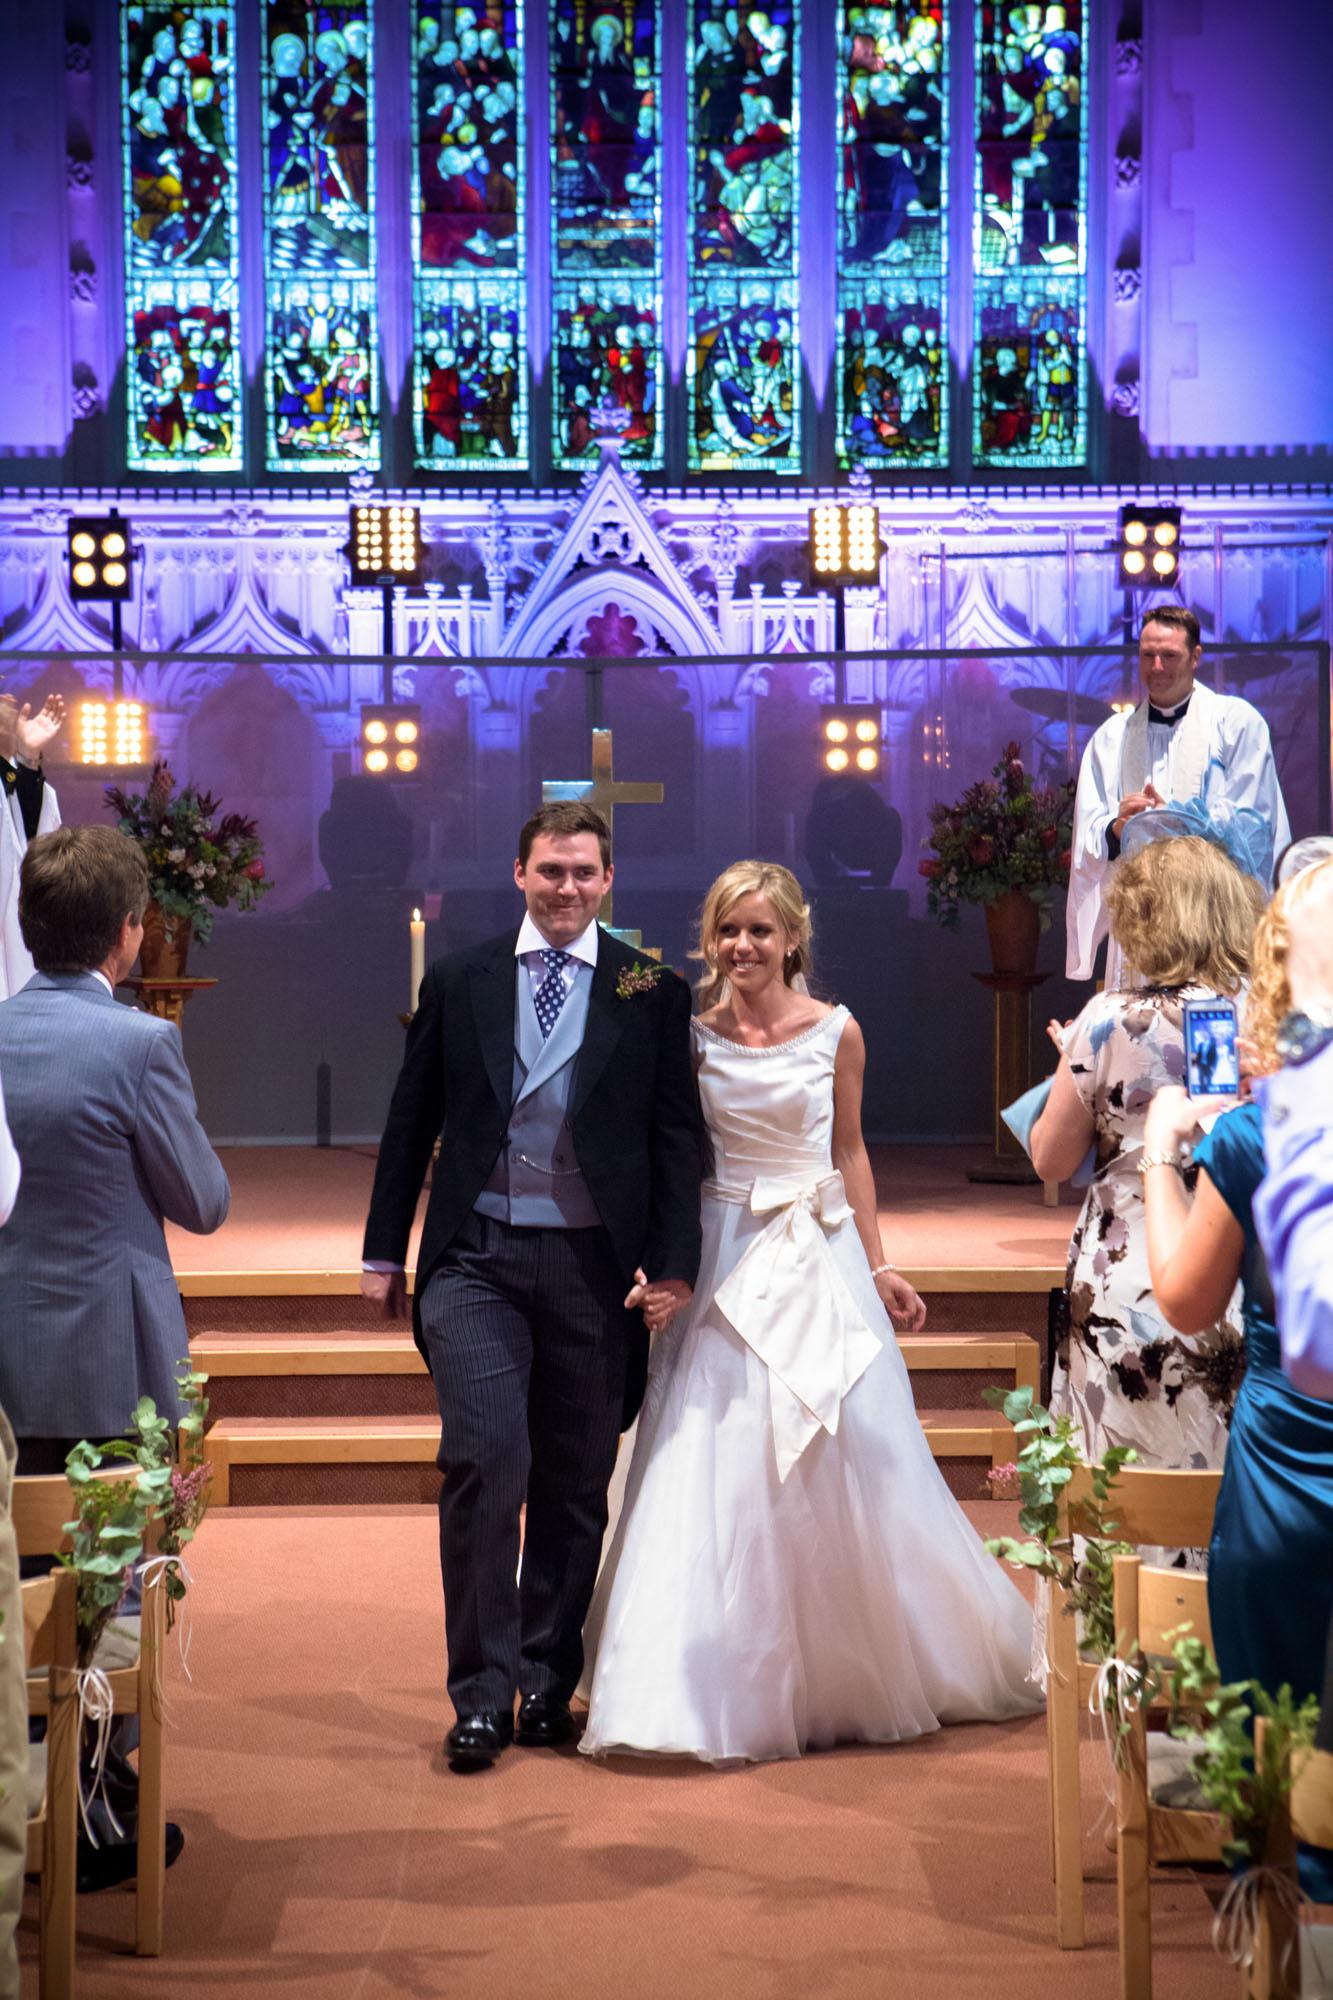 weddings-couples-love-photographer-oxford-london-jonathan-self-photography-42.jpg